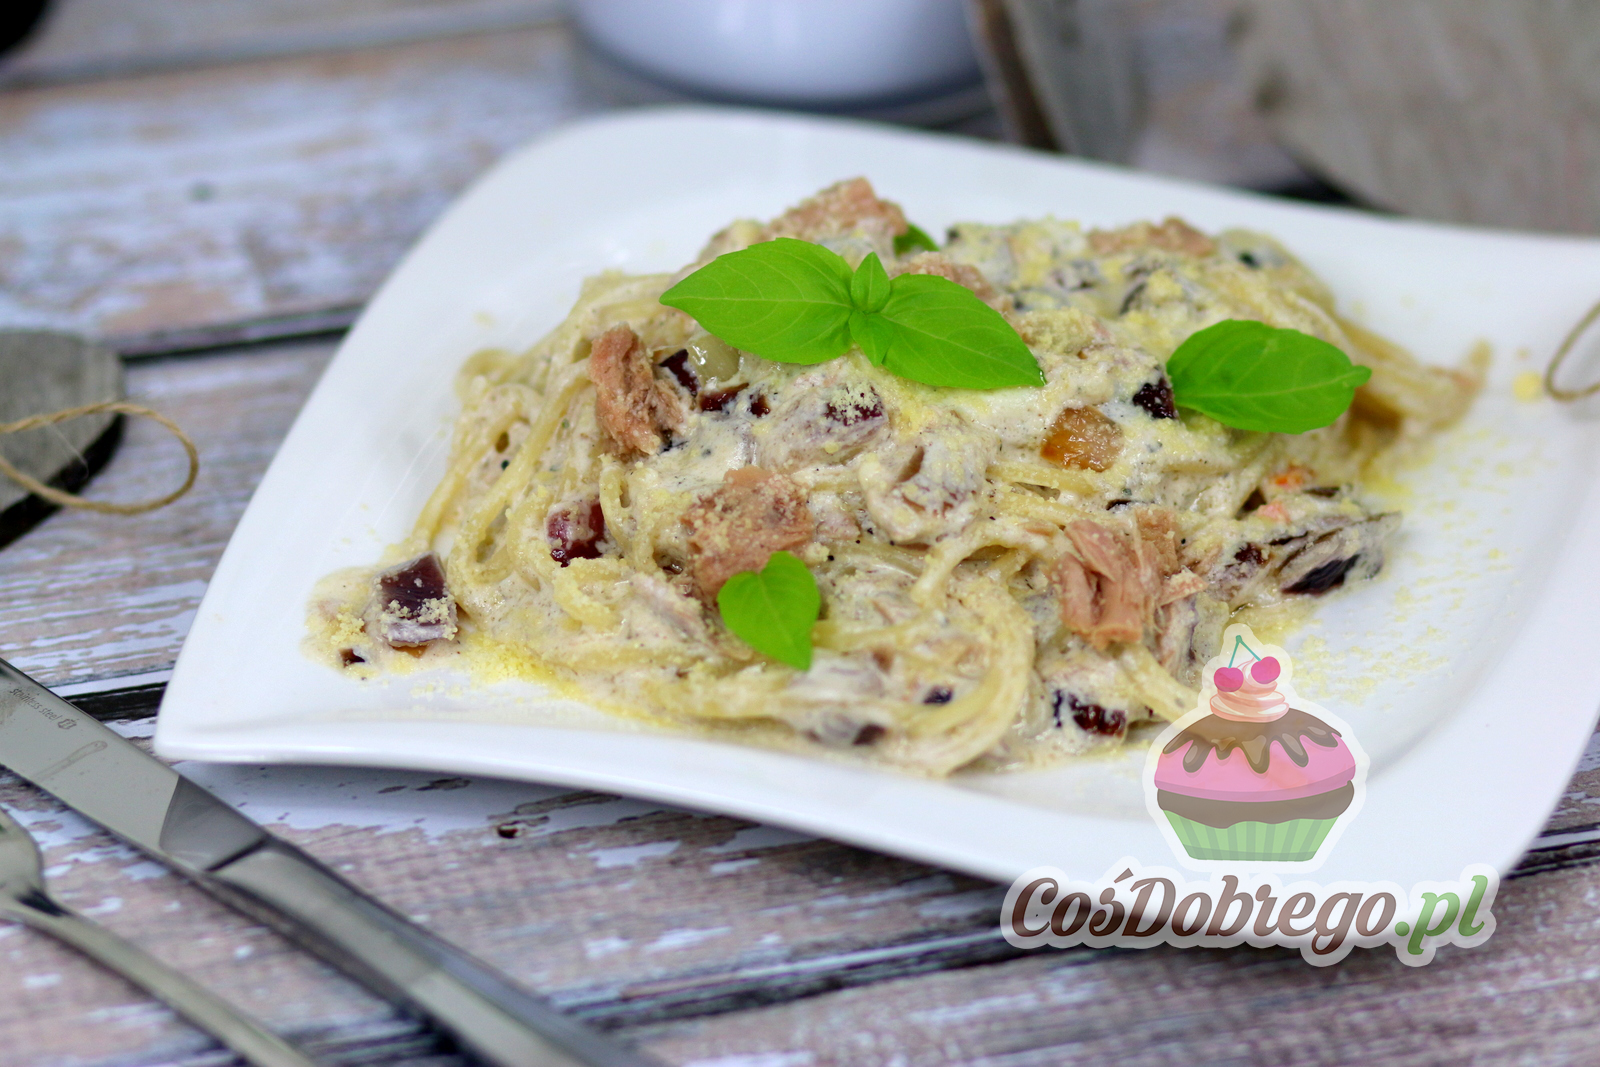 Kuchnia Włoska Cośdobregopl